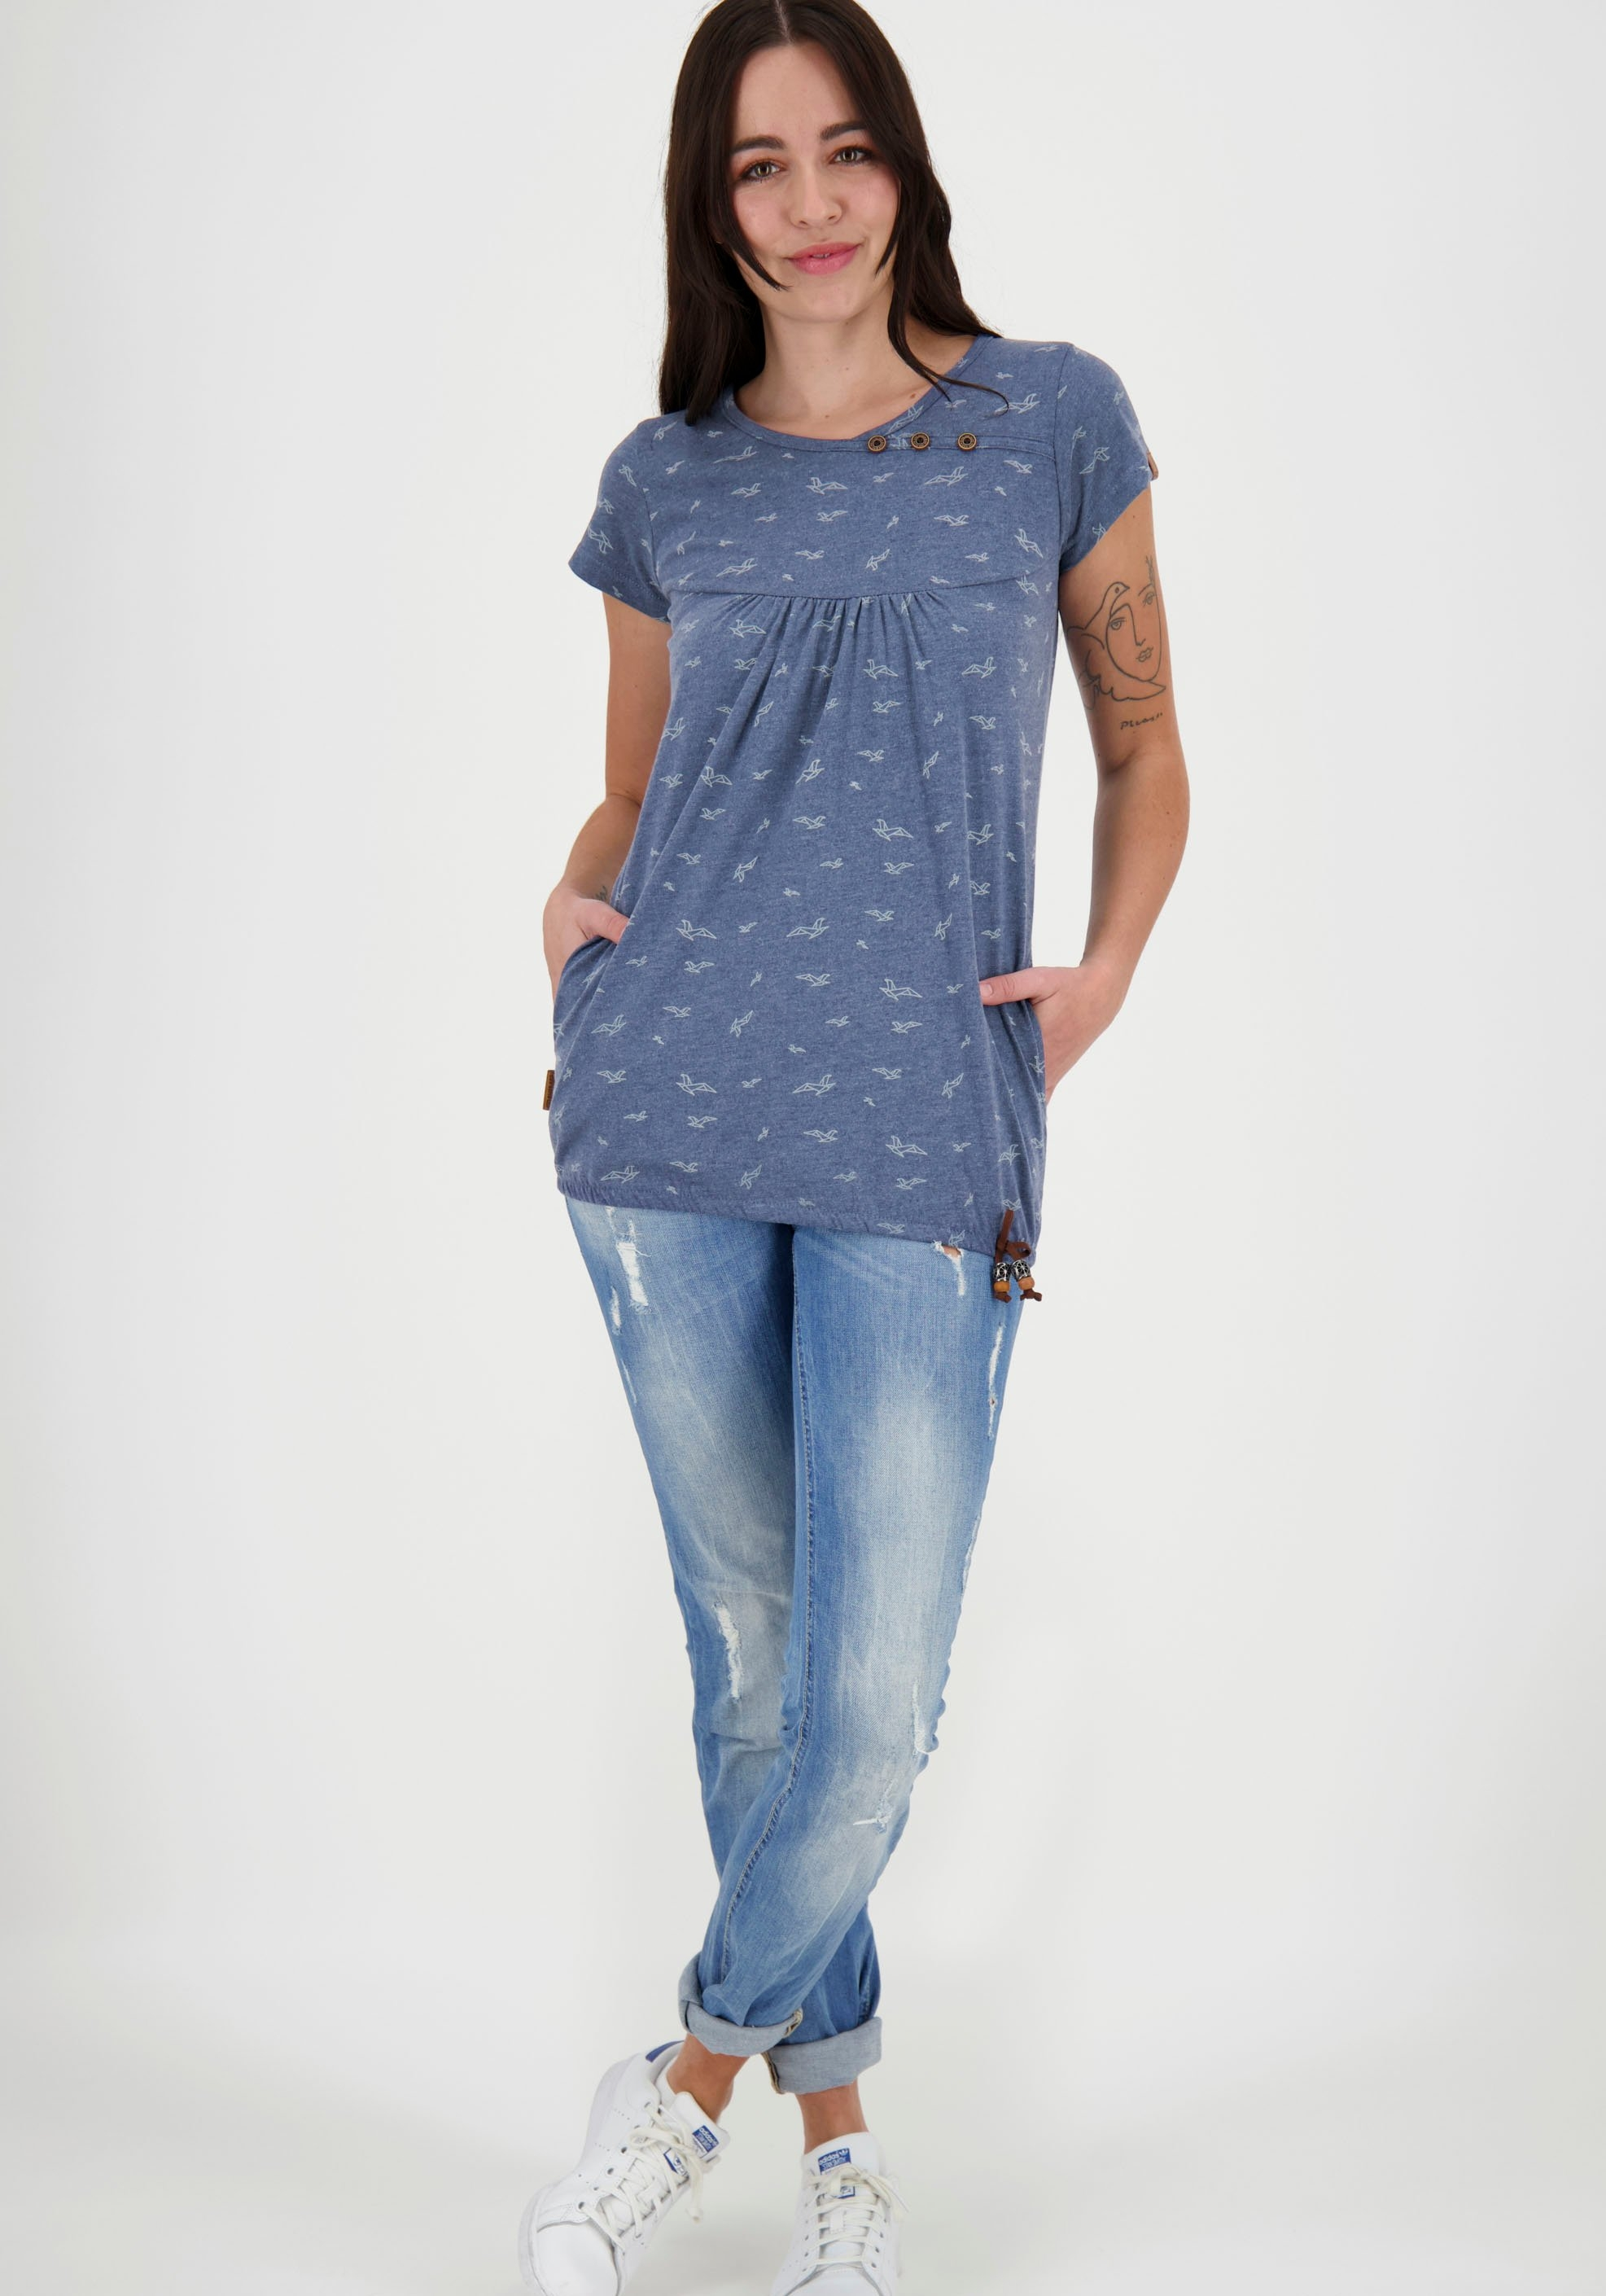 alife and kickin T-shirt SummerAK online kopen op otto.nl